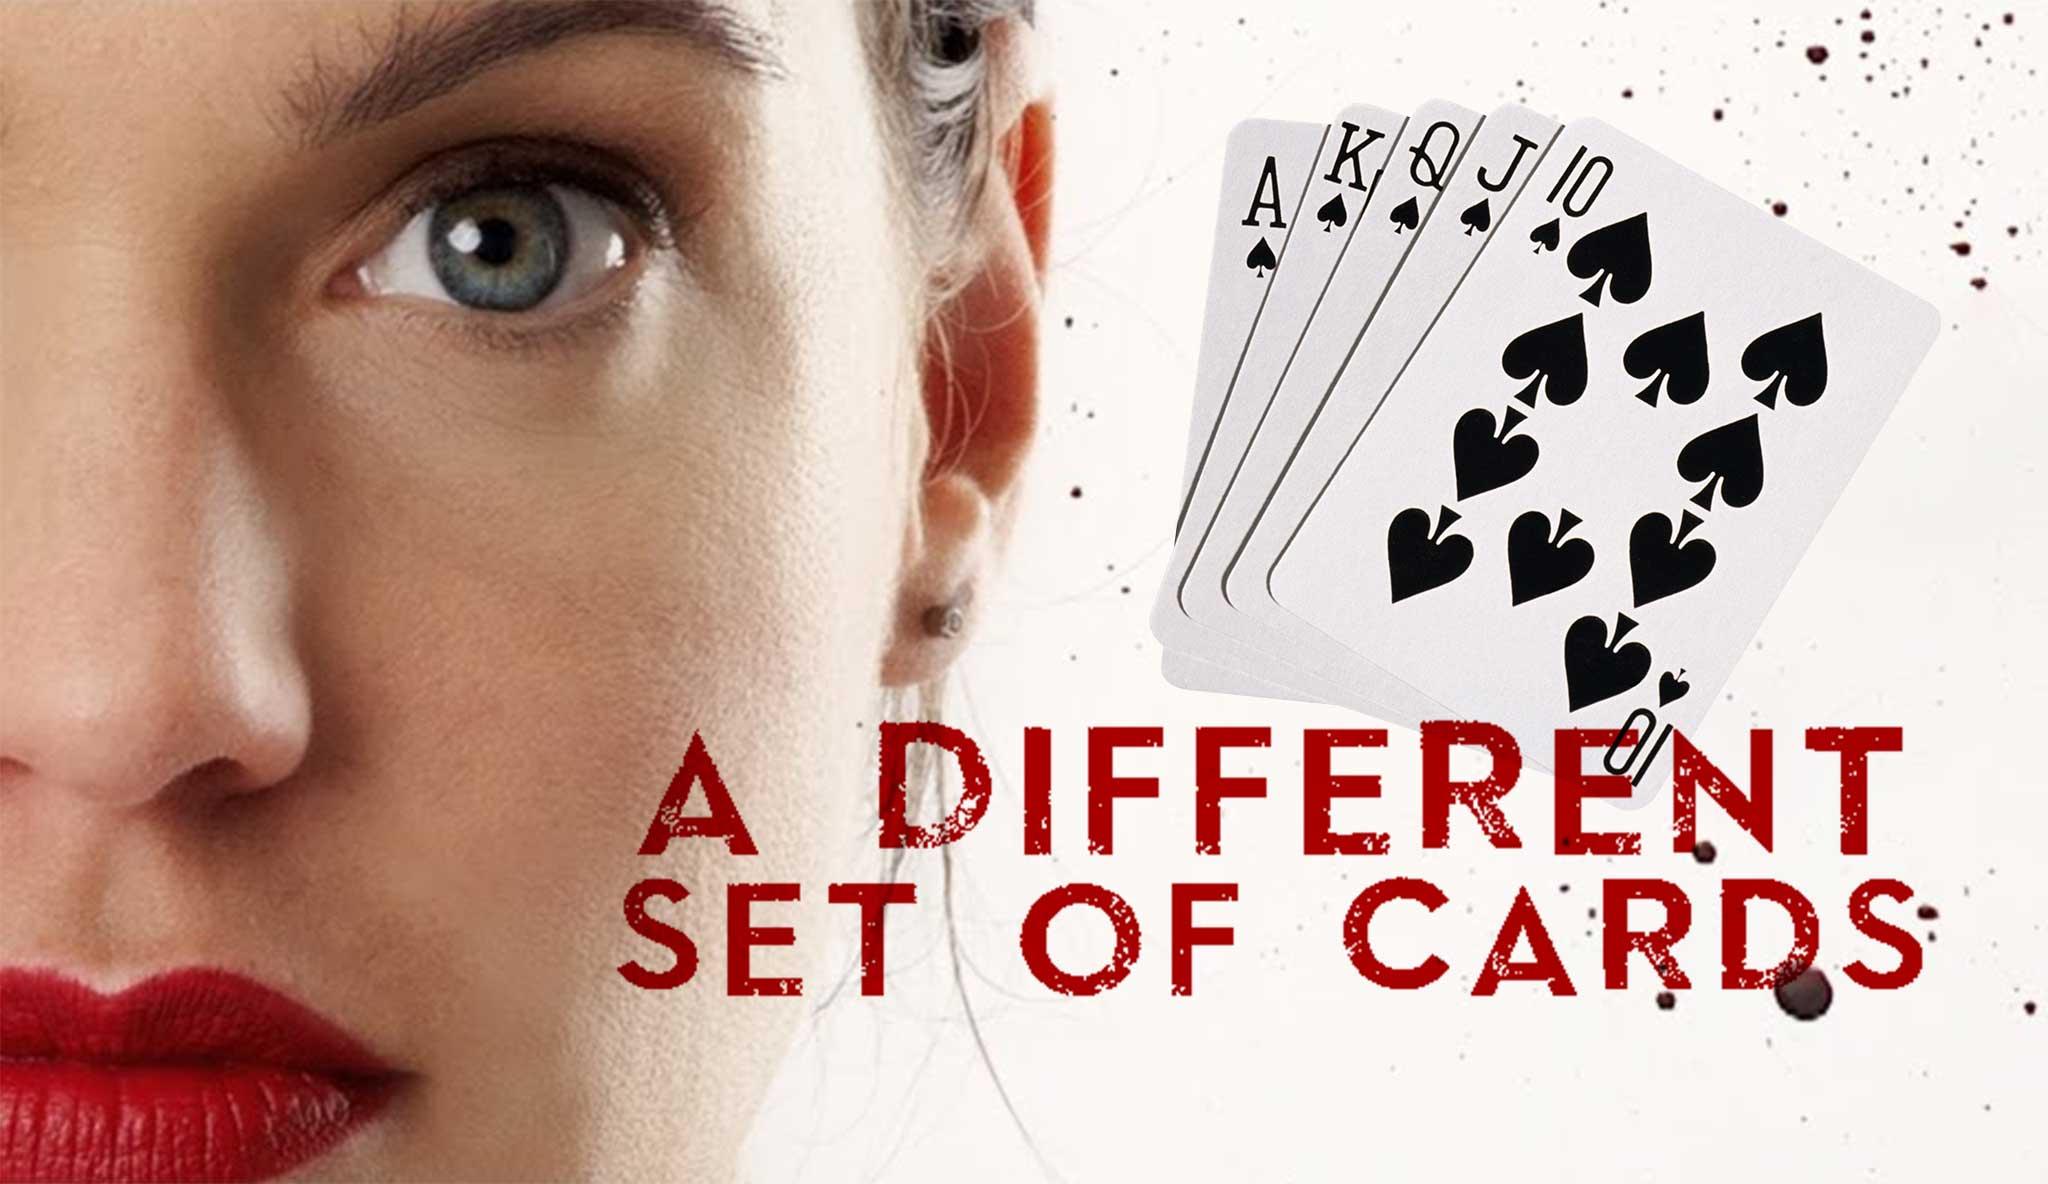 a-different-set-of-cards\header.jpg